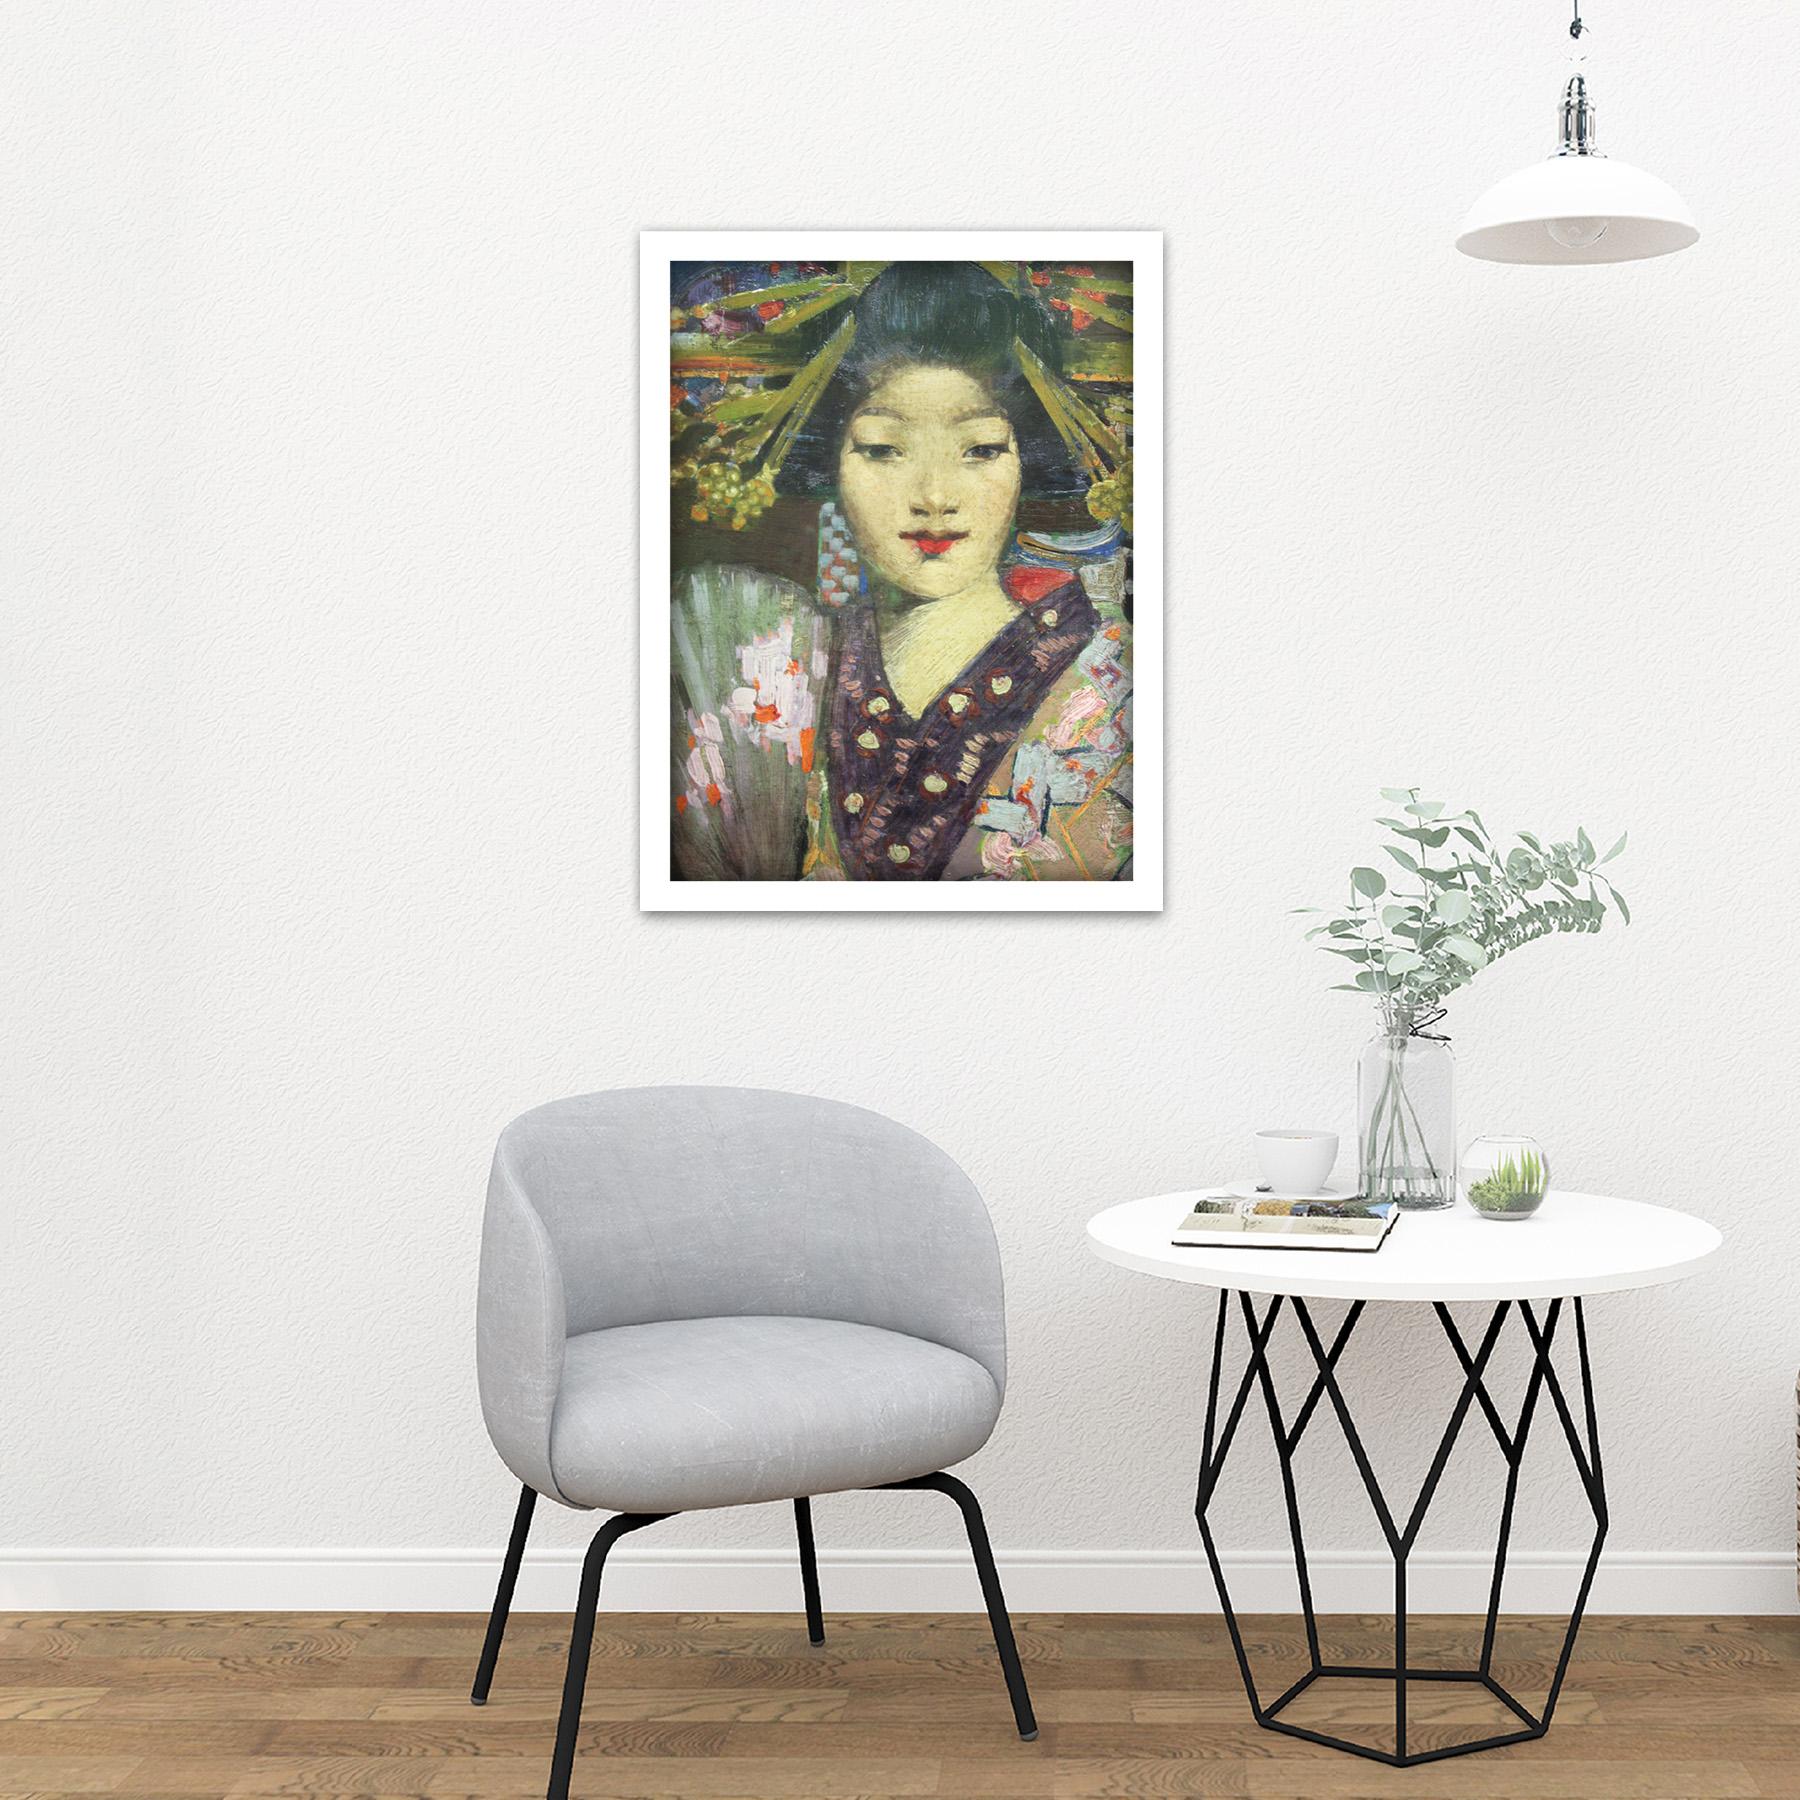 Henry-Geisha-Girl-Detail-Painting-Large-Framed-Art-Print thumbnail 23